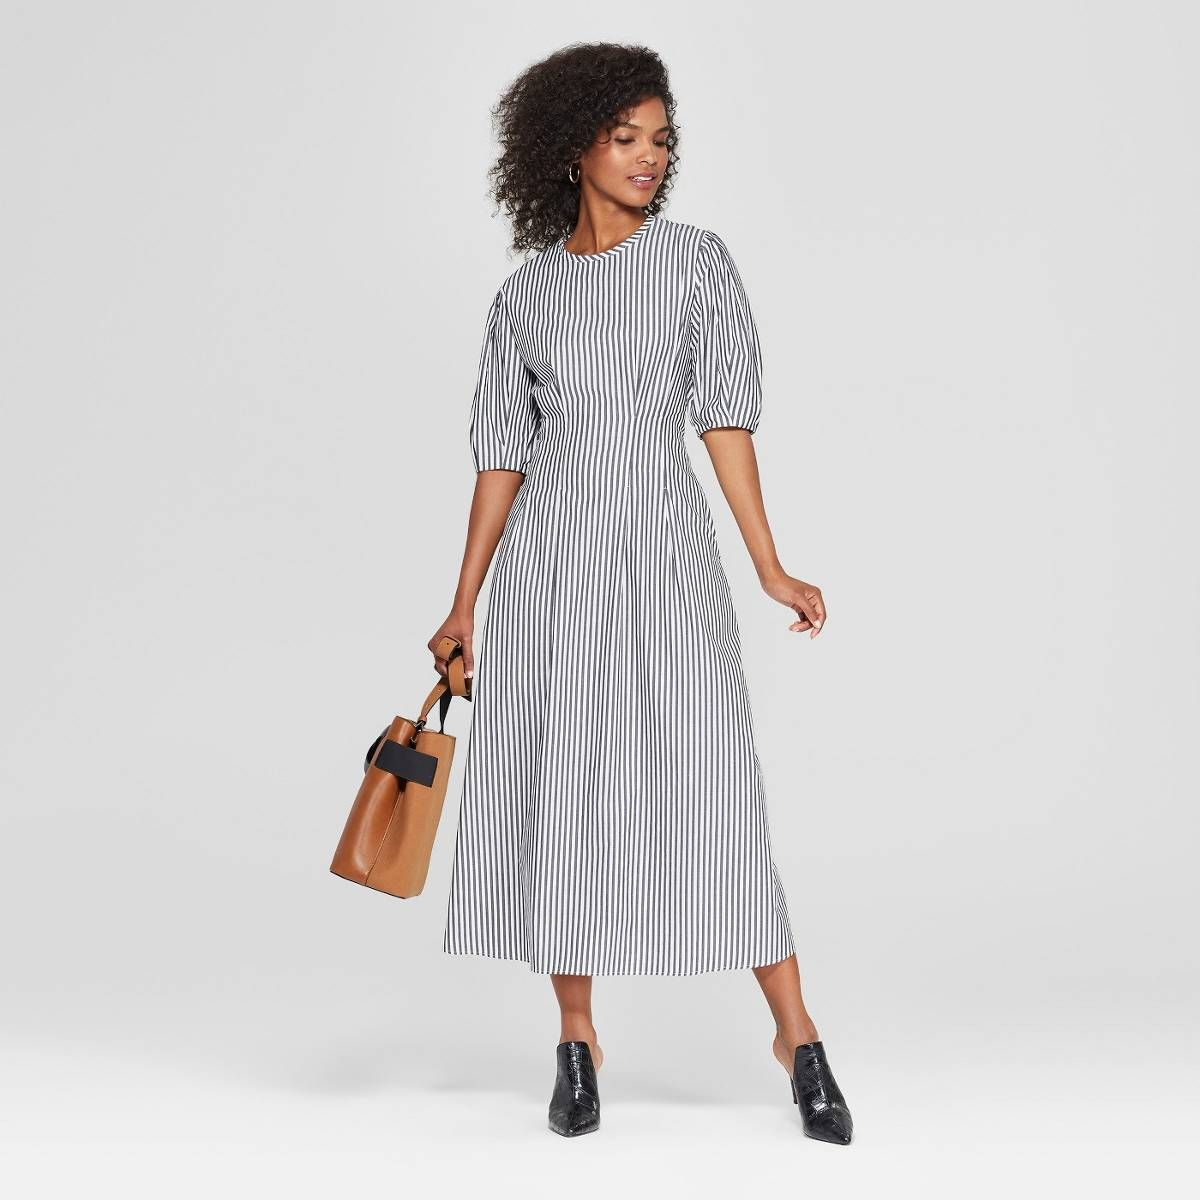 14 082 People Approve Of This Under 40 Dress Puff Sleeve Midi Dresses Dresses Midi Dress [ 1200 x 1200 Pixel ]